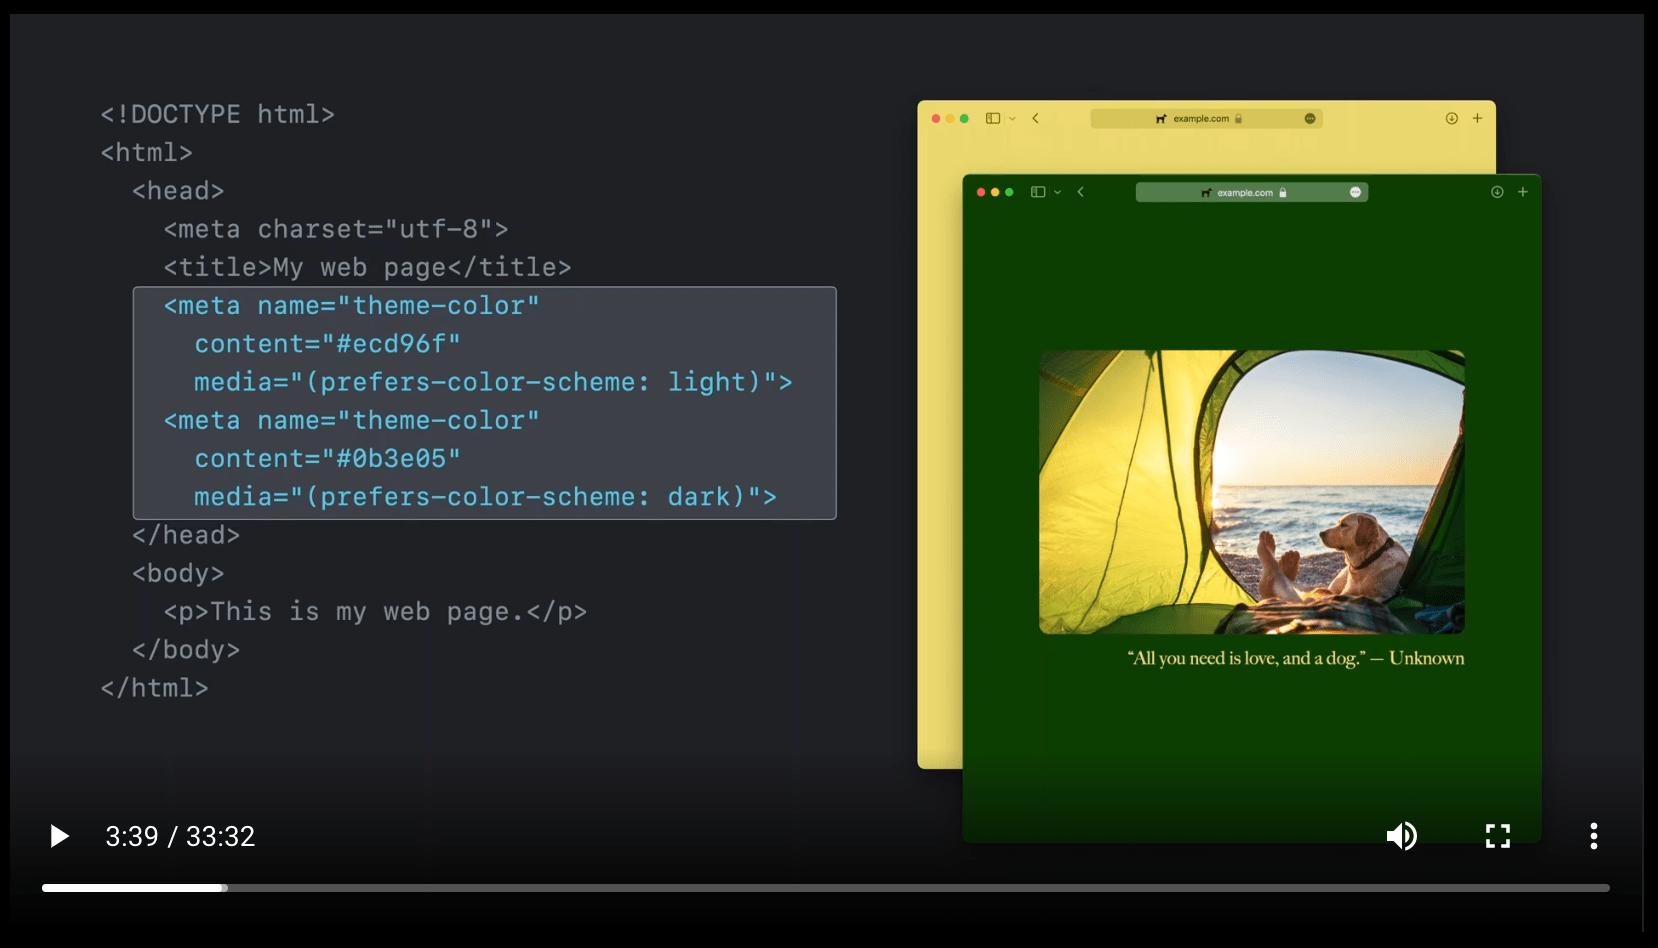 Safari 15: New UI, Theme Colors, and… a CSS-Tricks Cameo! 6